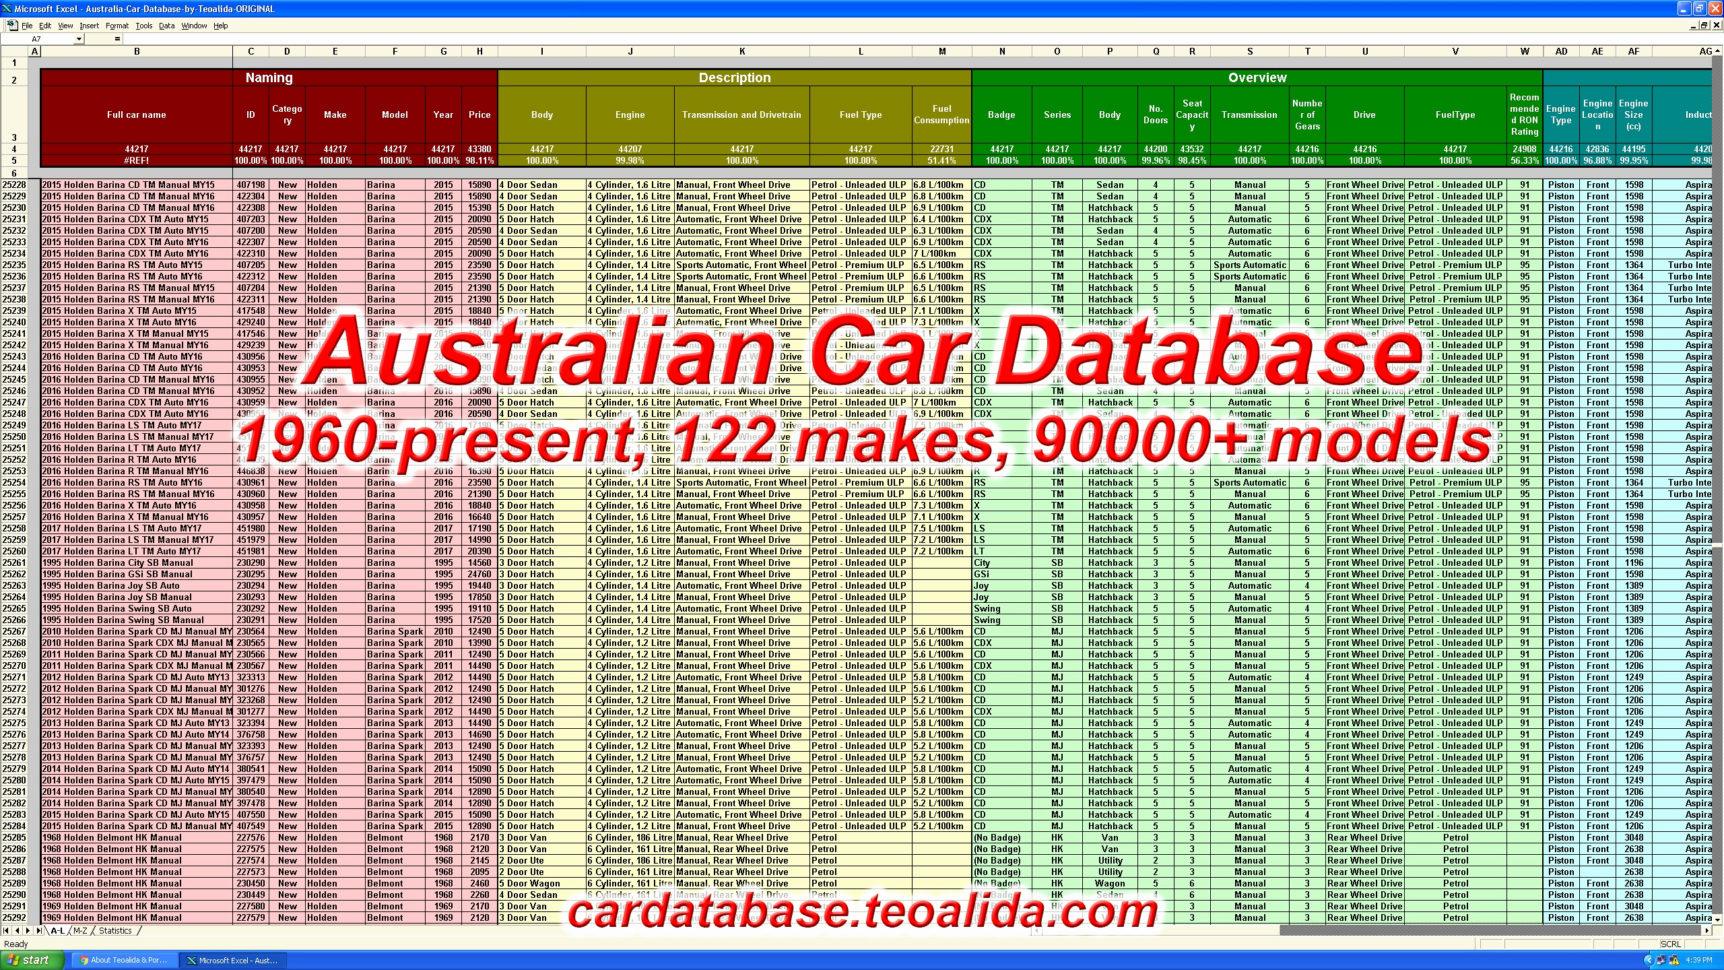 Car Shopping Spreadsheet Pertaining To Car Shopping